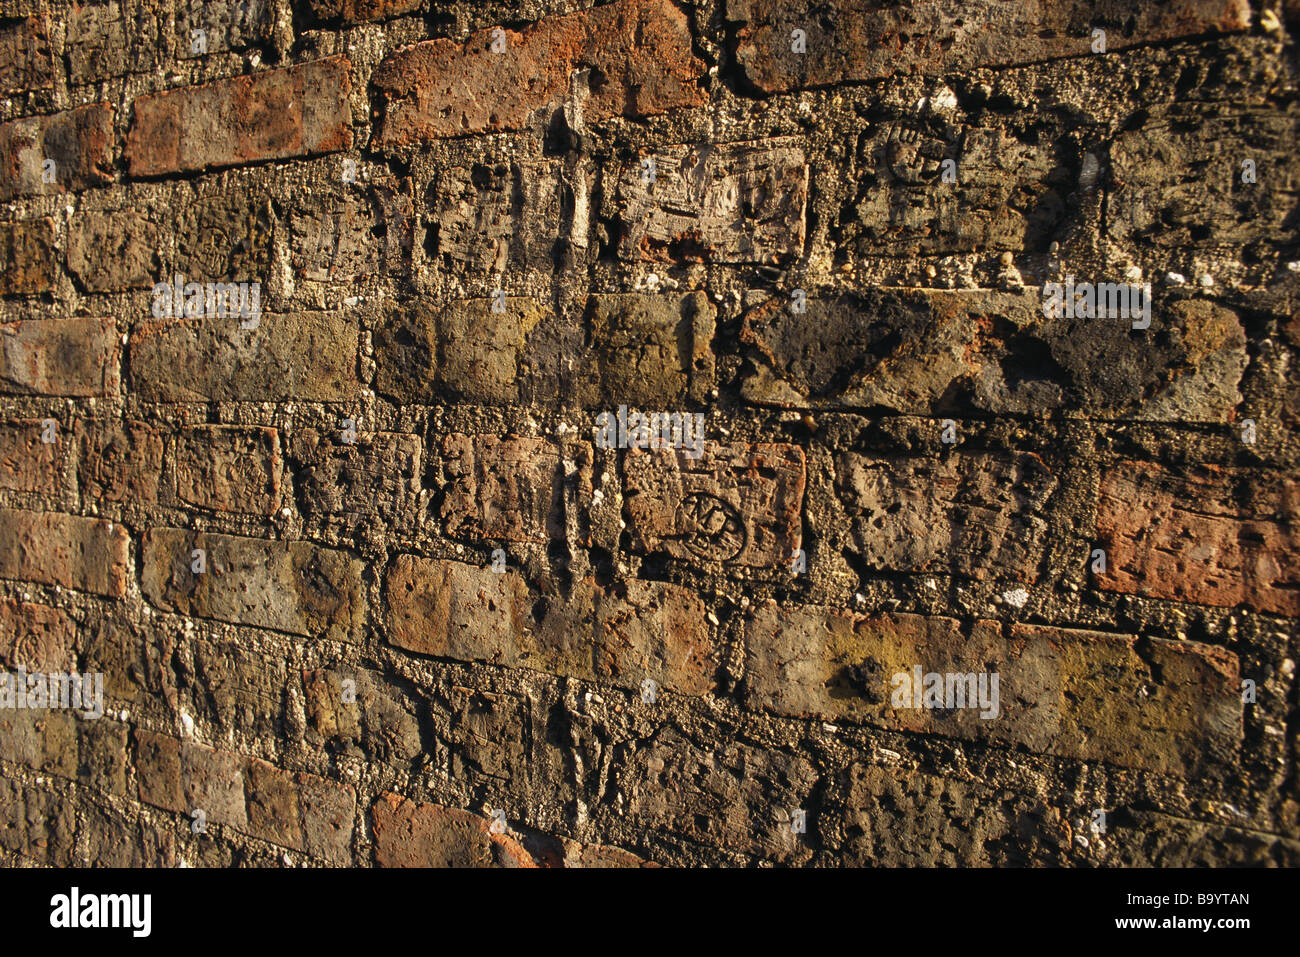 Ziegelmauer, close-up Stockbild